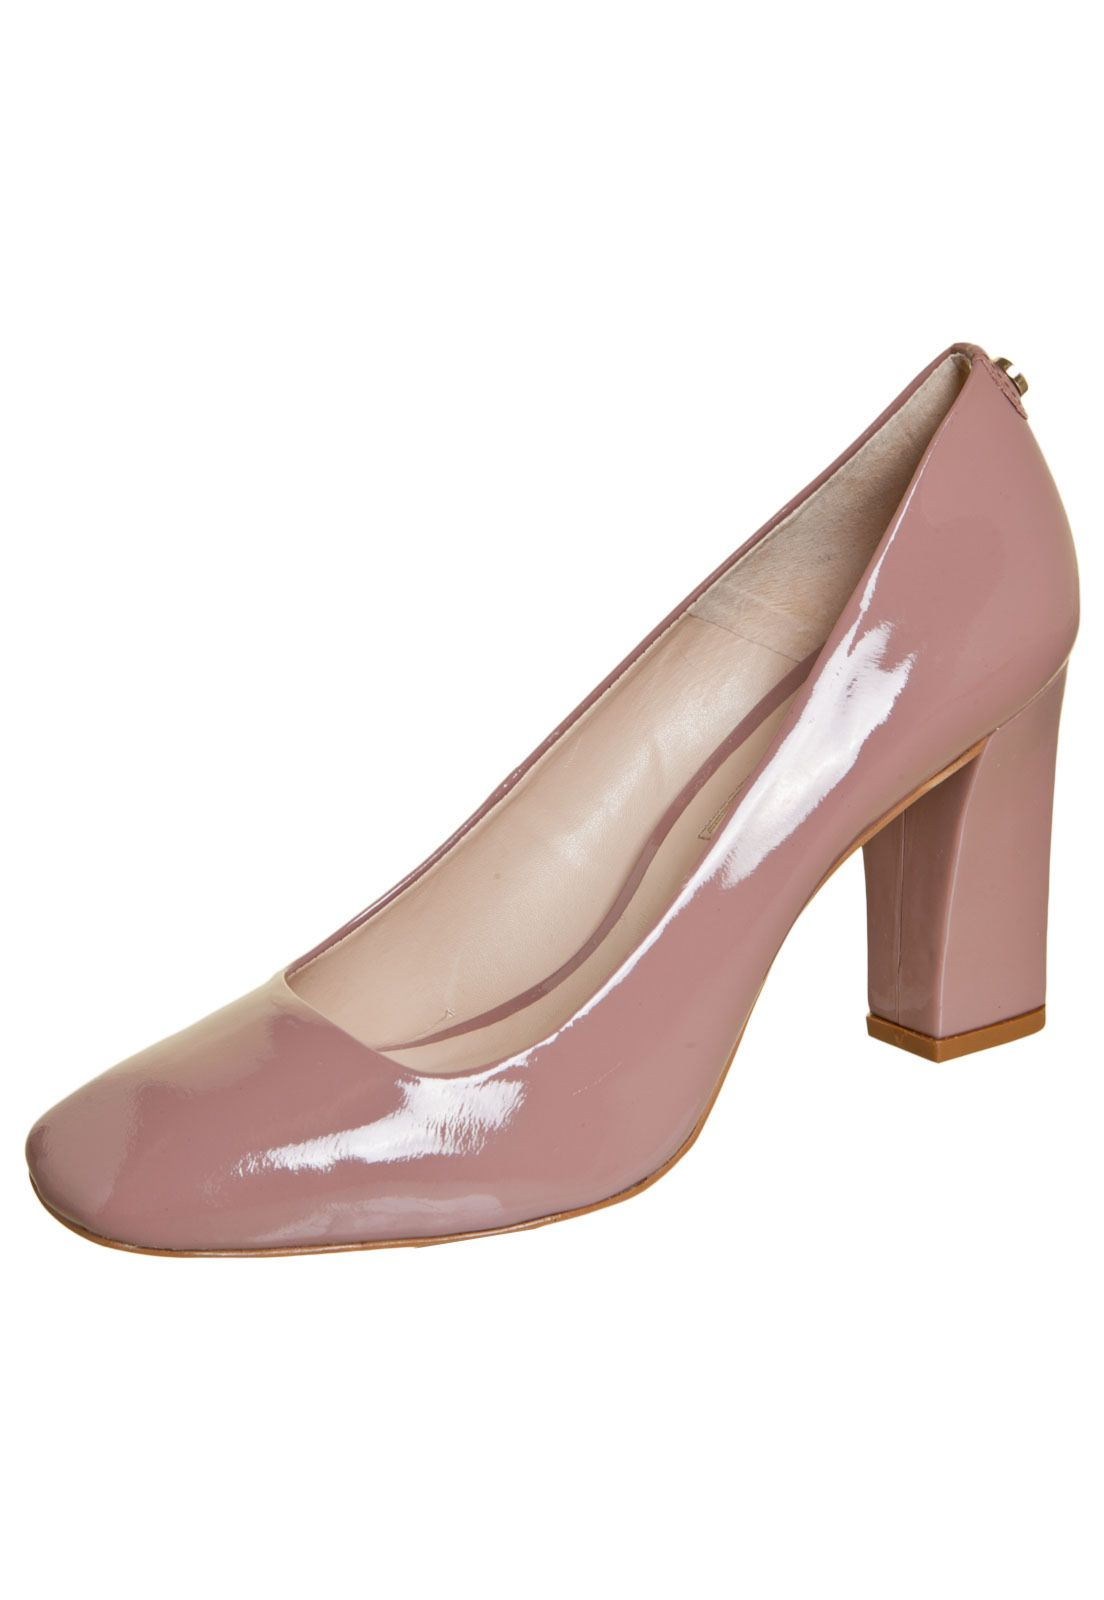 Sofisticata | Sapato Scarpin Bico Quadrado Salto Baixo